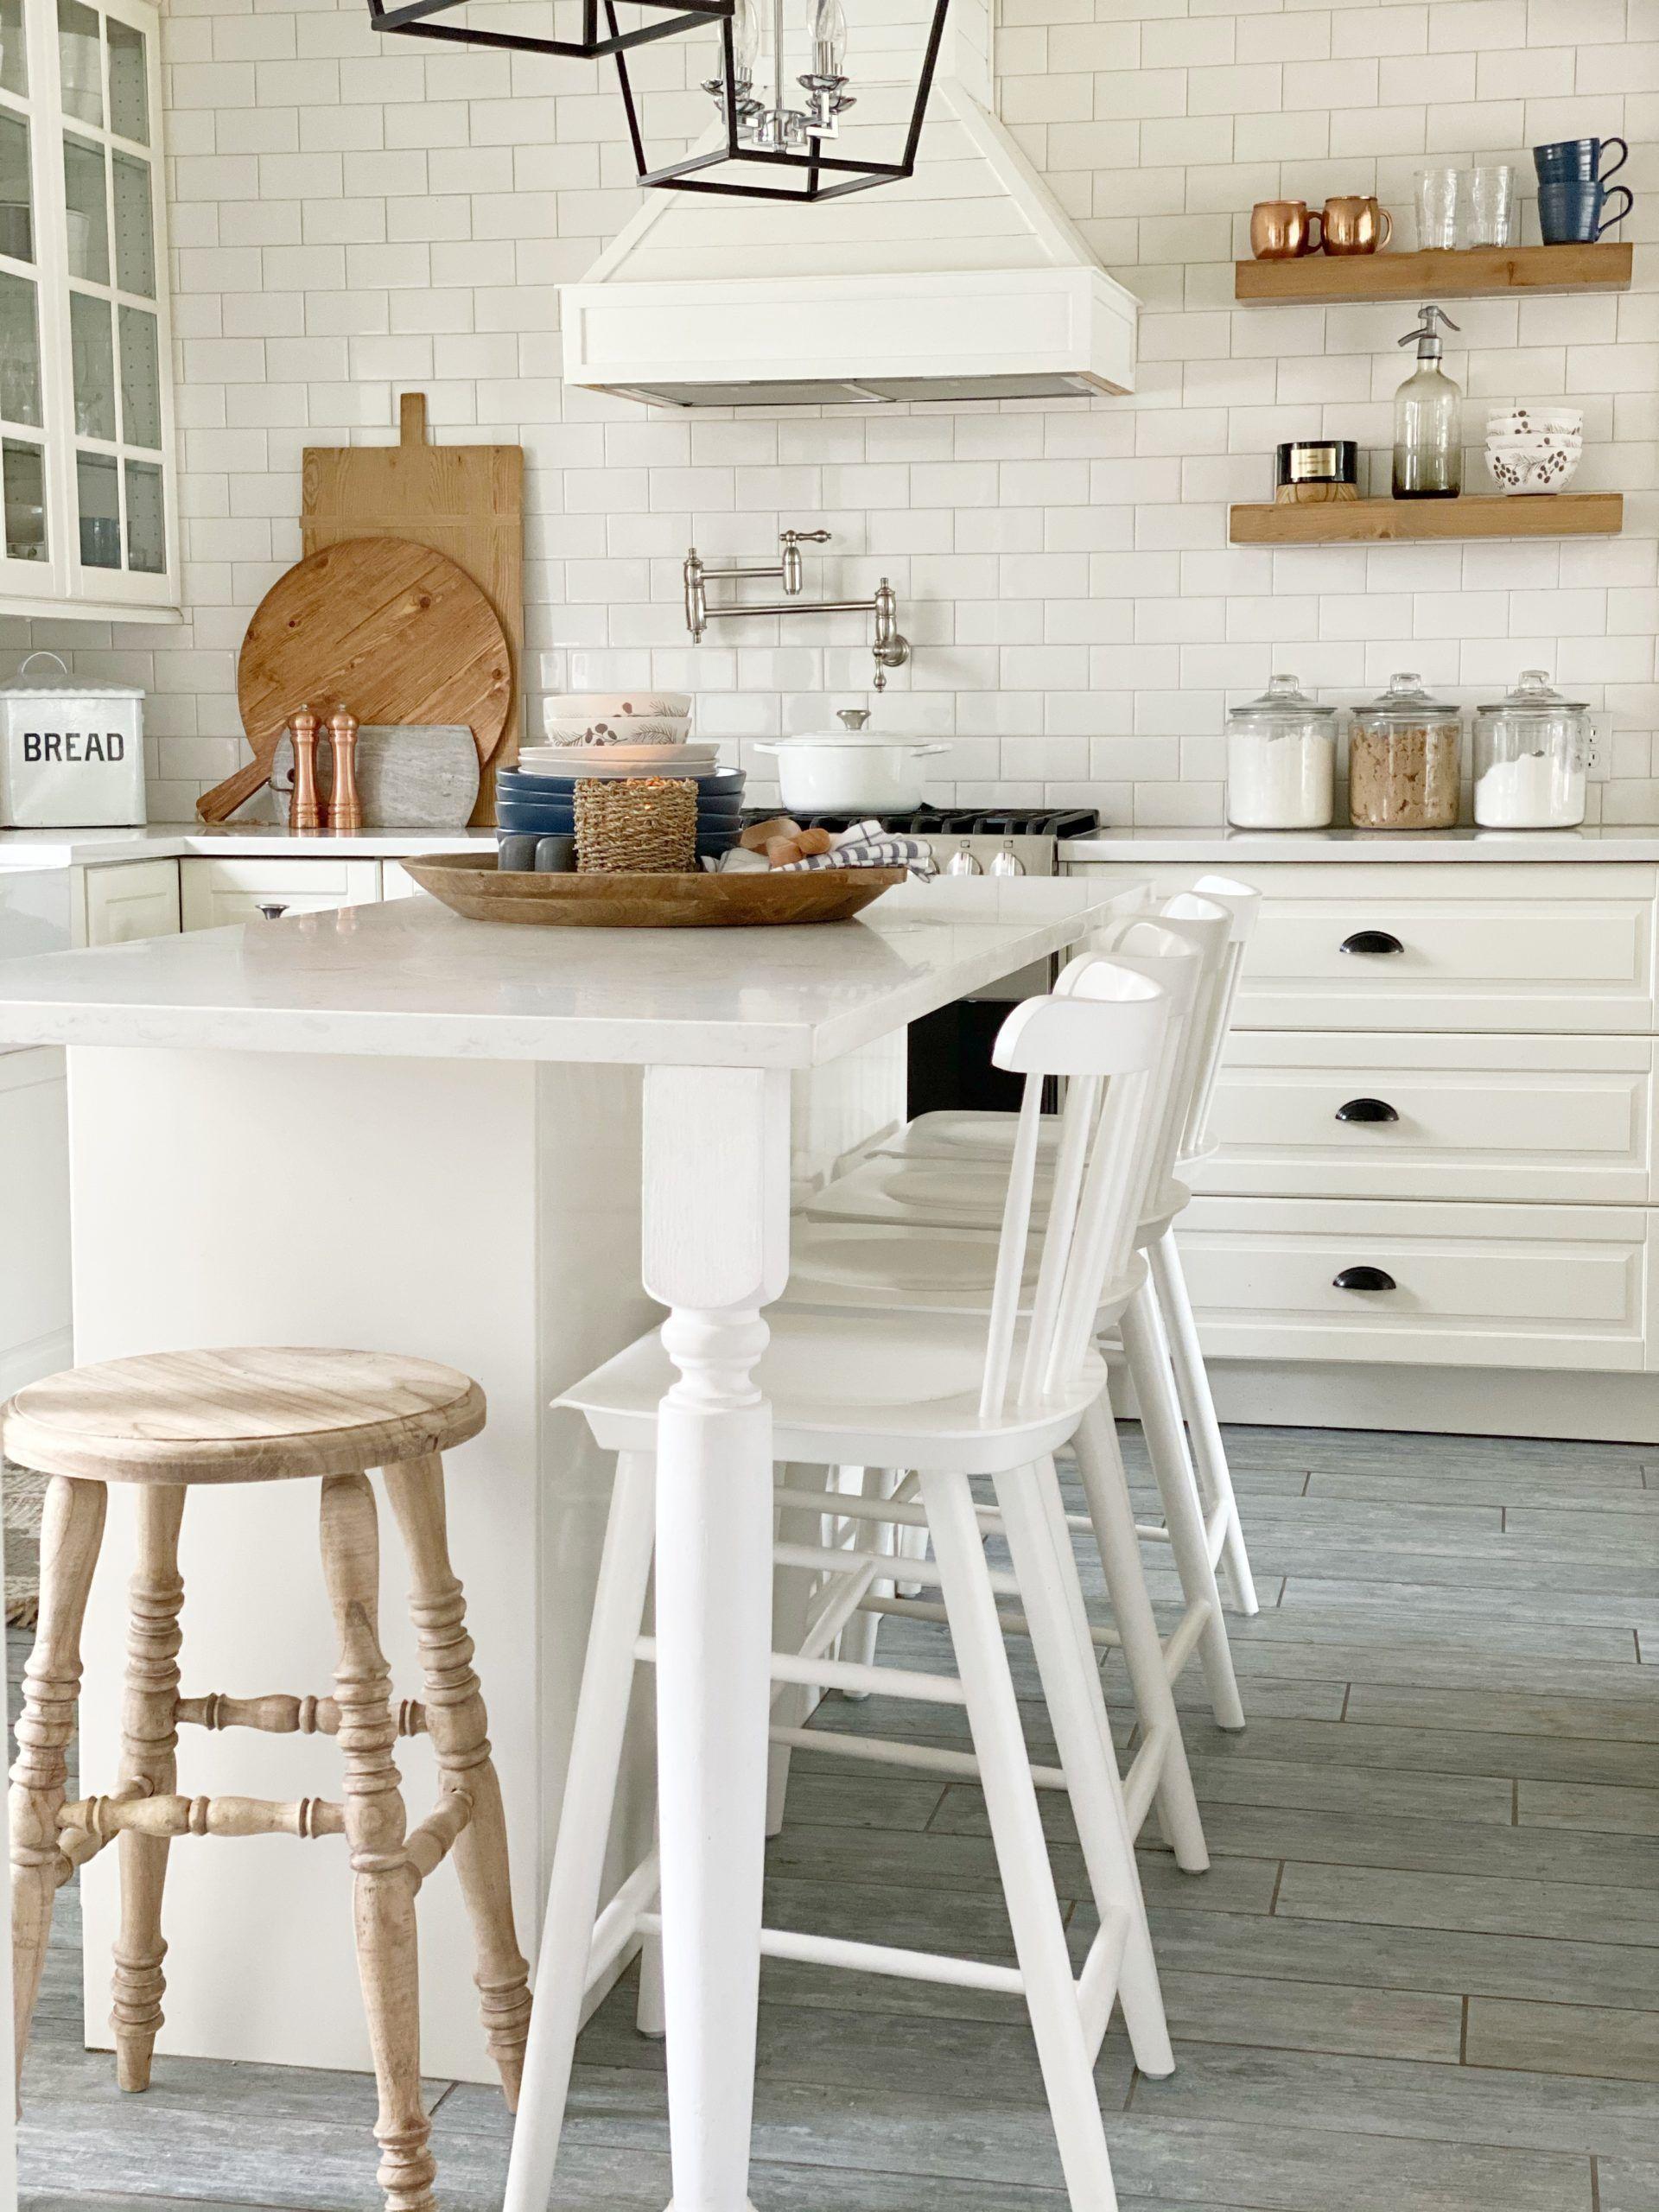 Fall Decor Ideas Bed Bath Beyond Kitchen Decor Inspiration Kitchen Design Color Small Cottage Kitchen